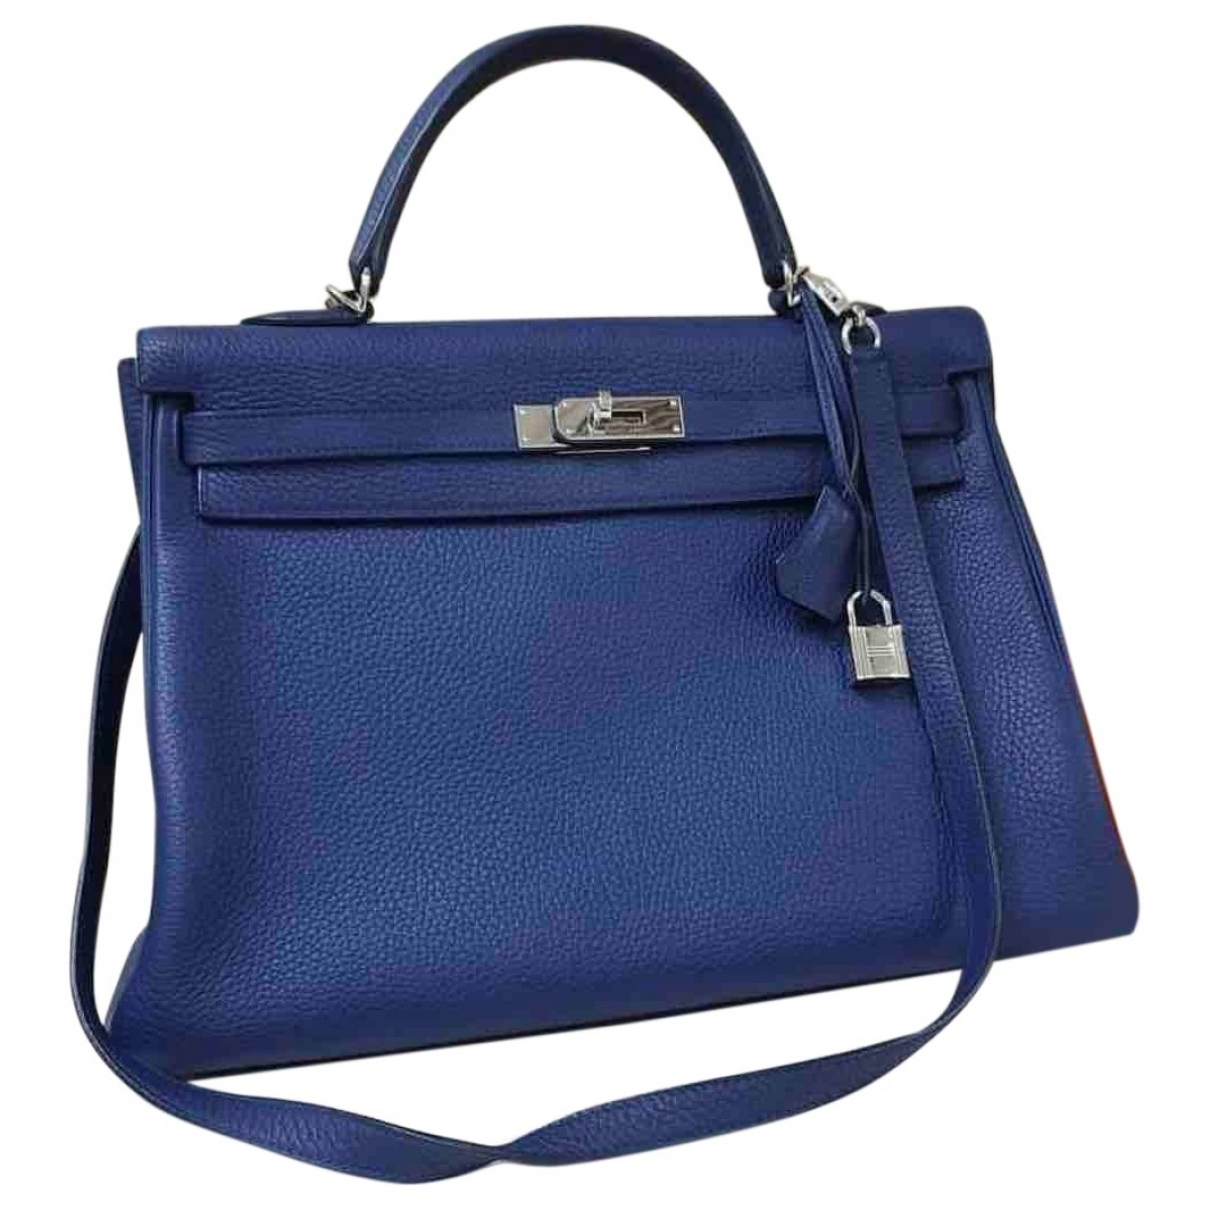 Hermes Kelly 35 Handtasche in  Blau Leder